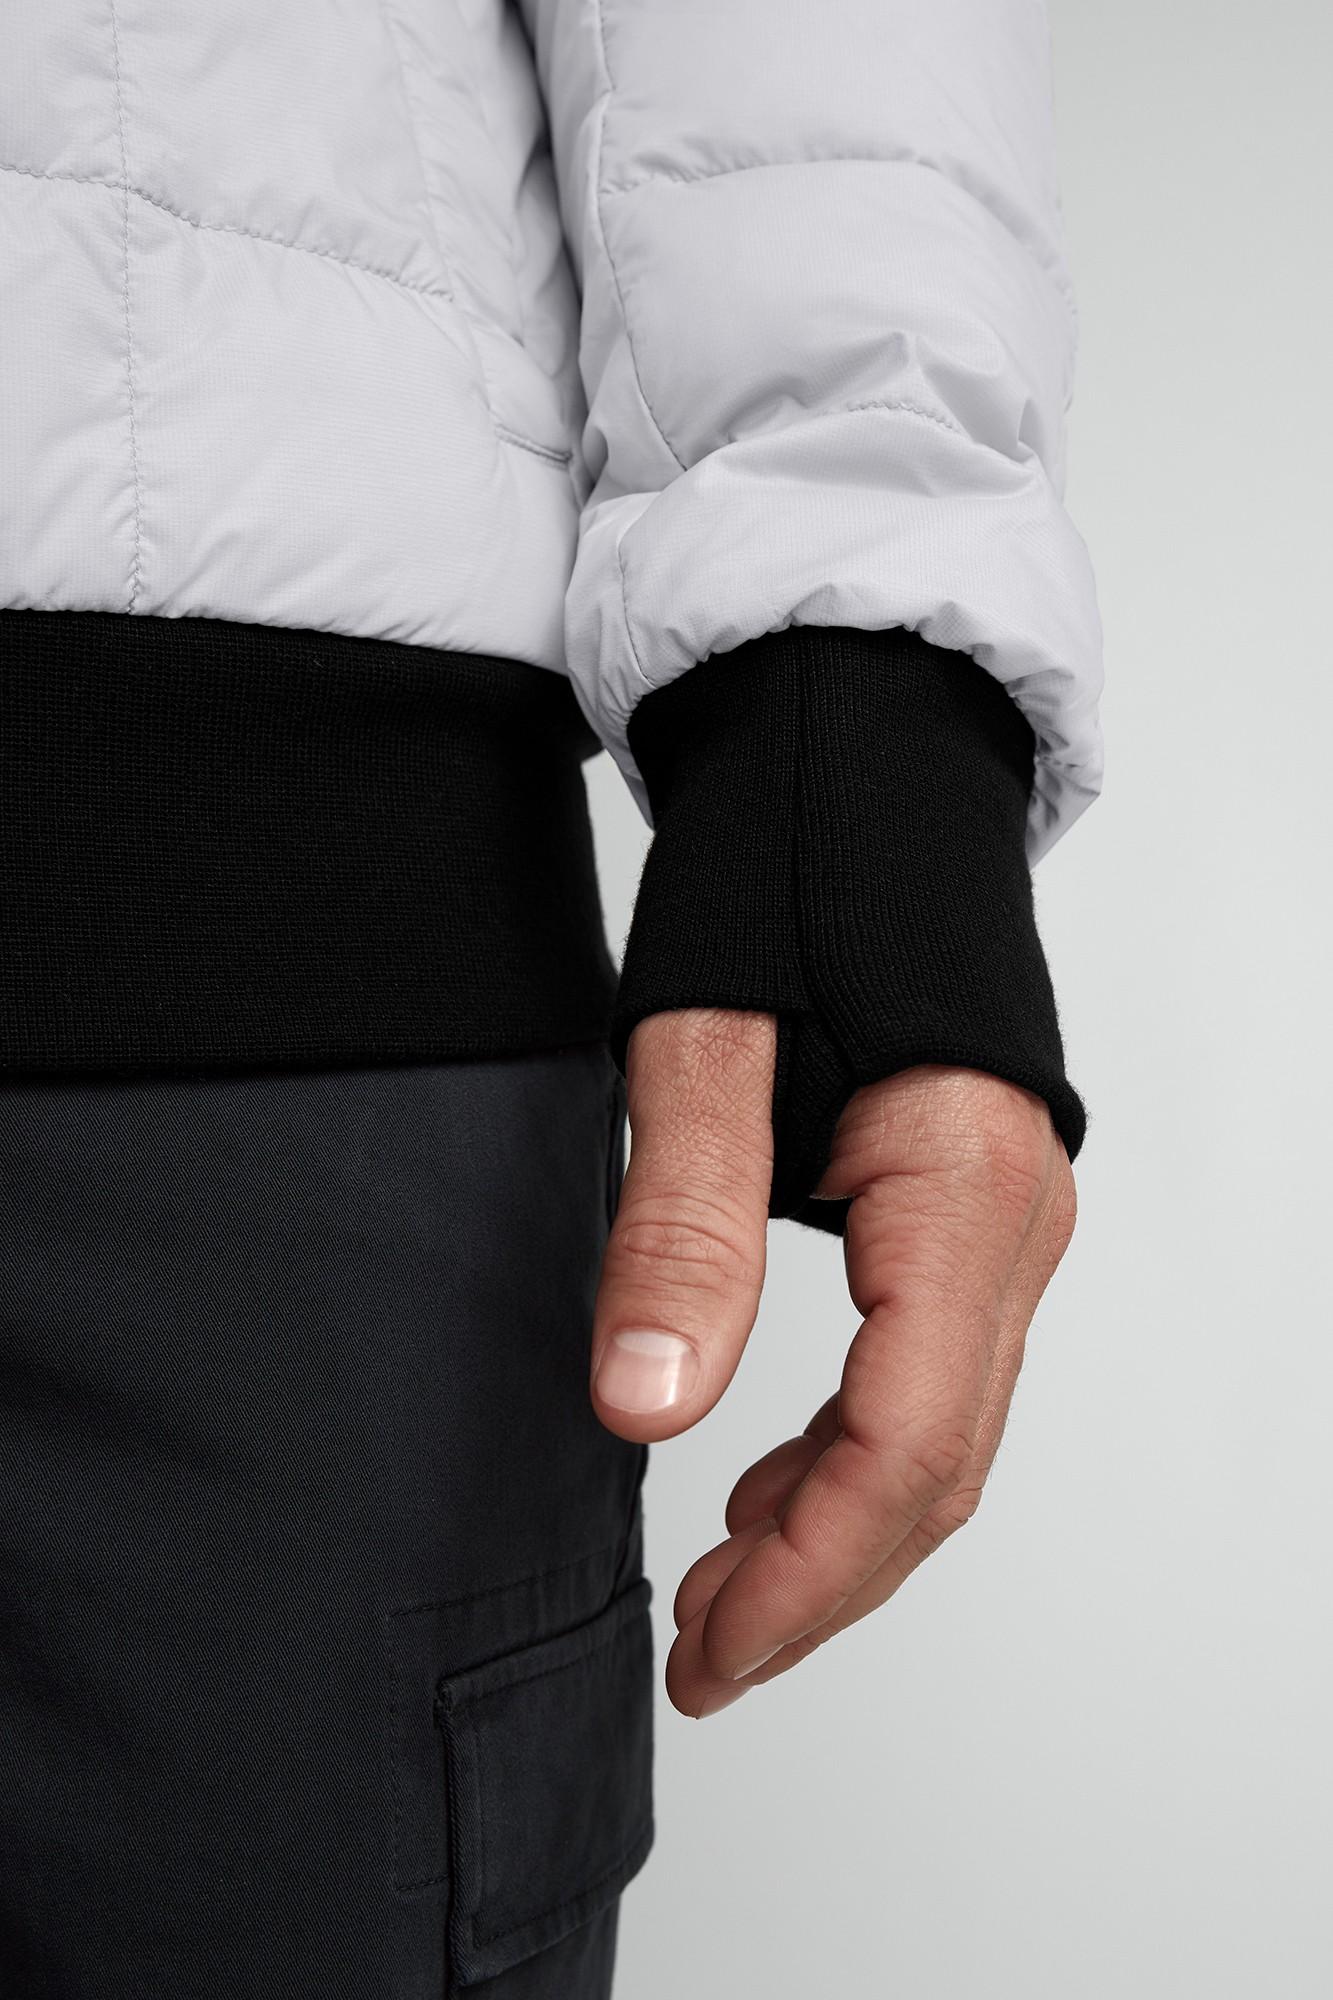 Sports High-Vis Wrist Pocket Ultimate Performance™ Reflective Wrist Runner